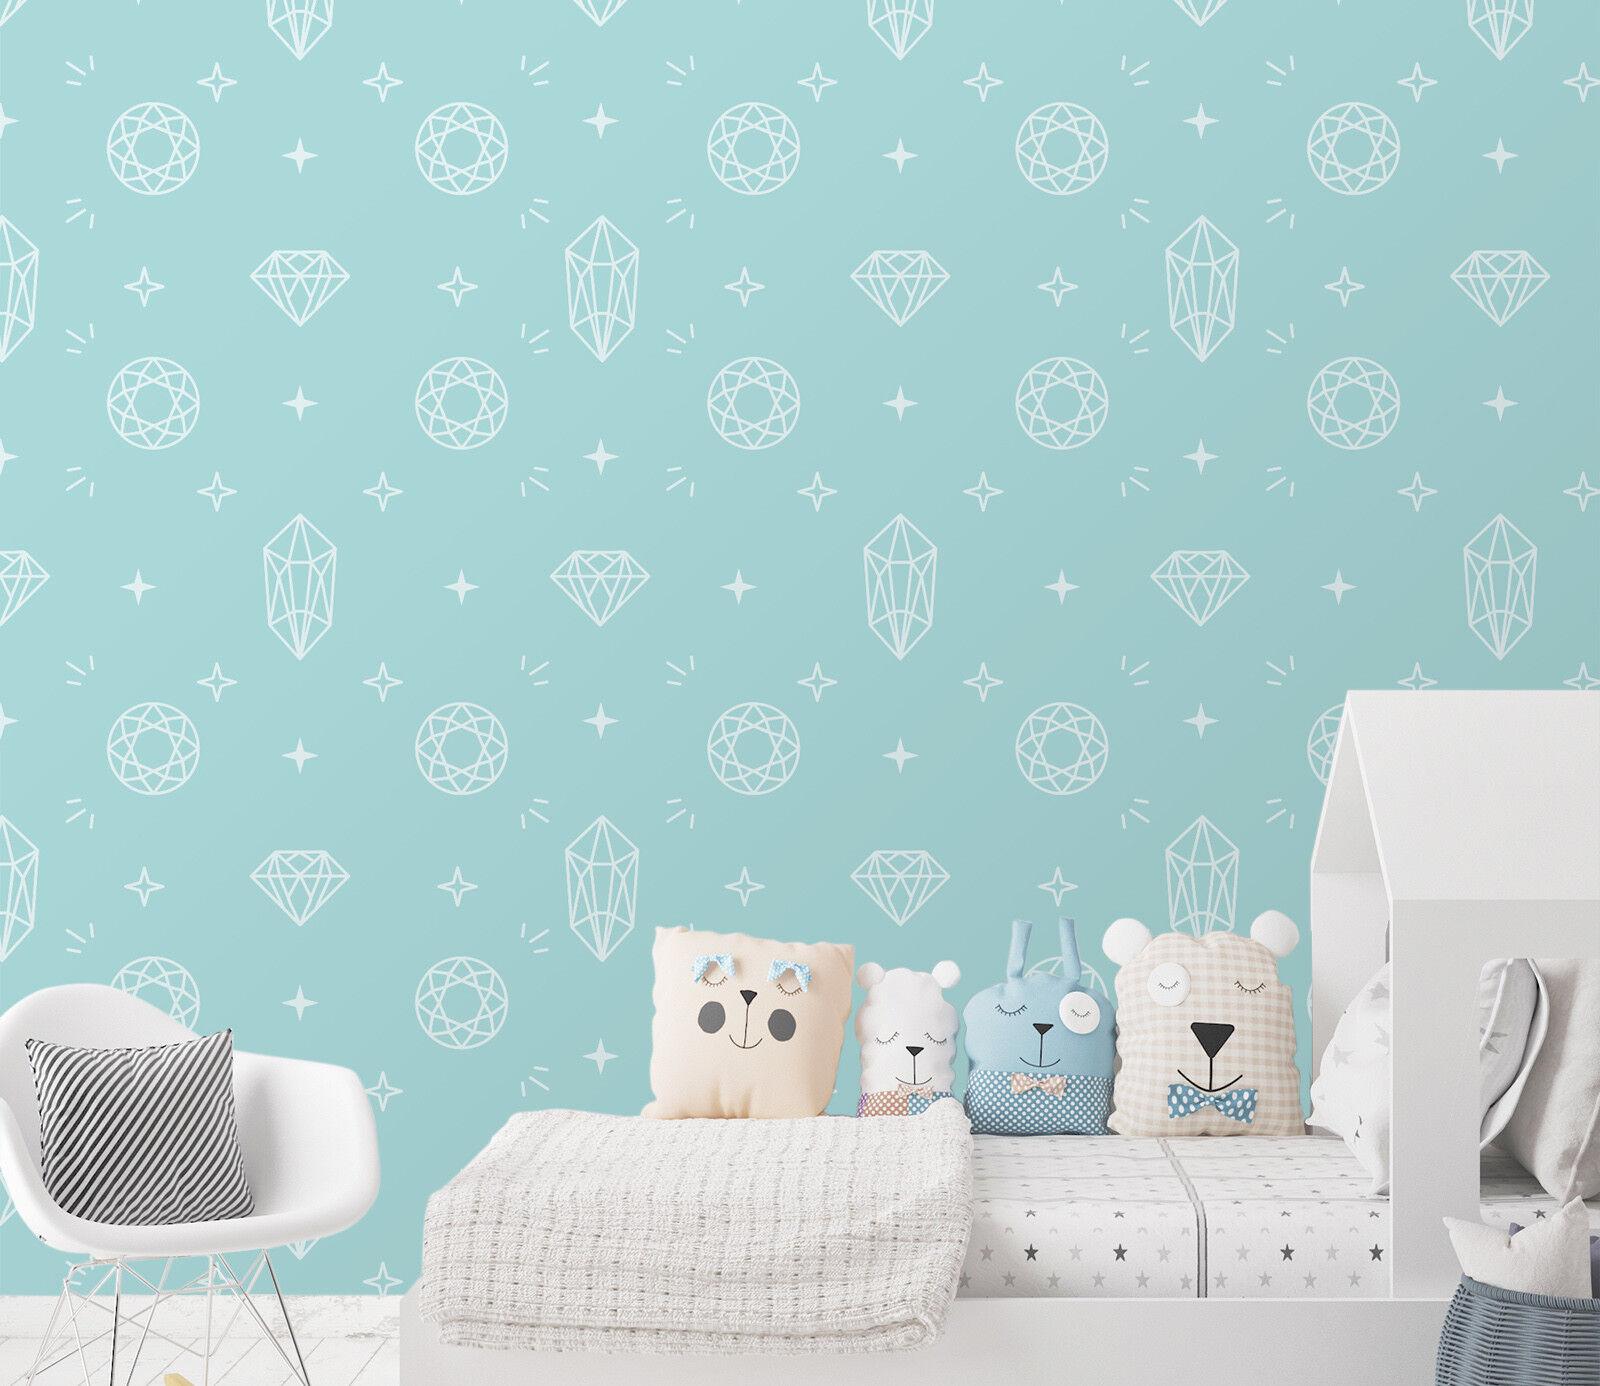 3D Niedlich Blaue Muster 21 Tapete Wandgemälde Tapete Tapeten Familie Kinde DE